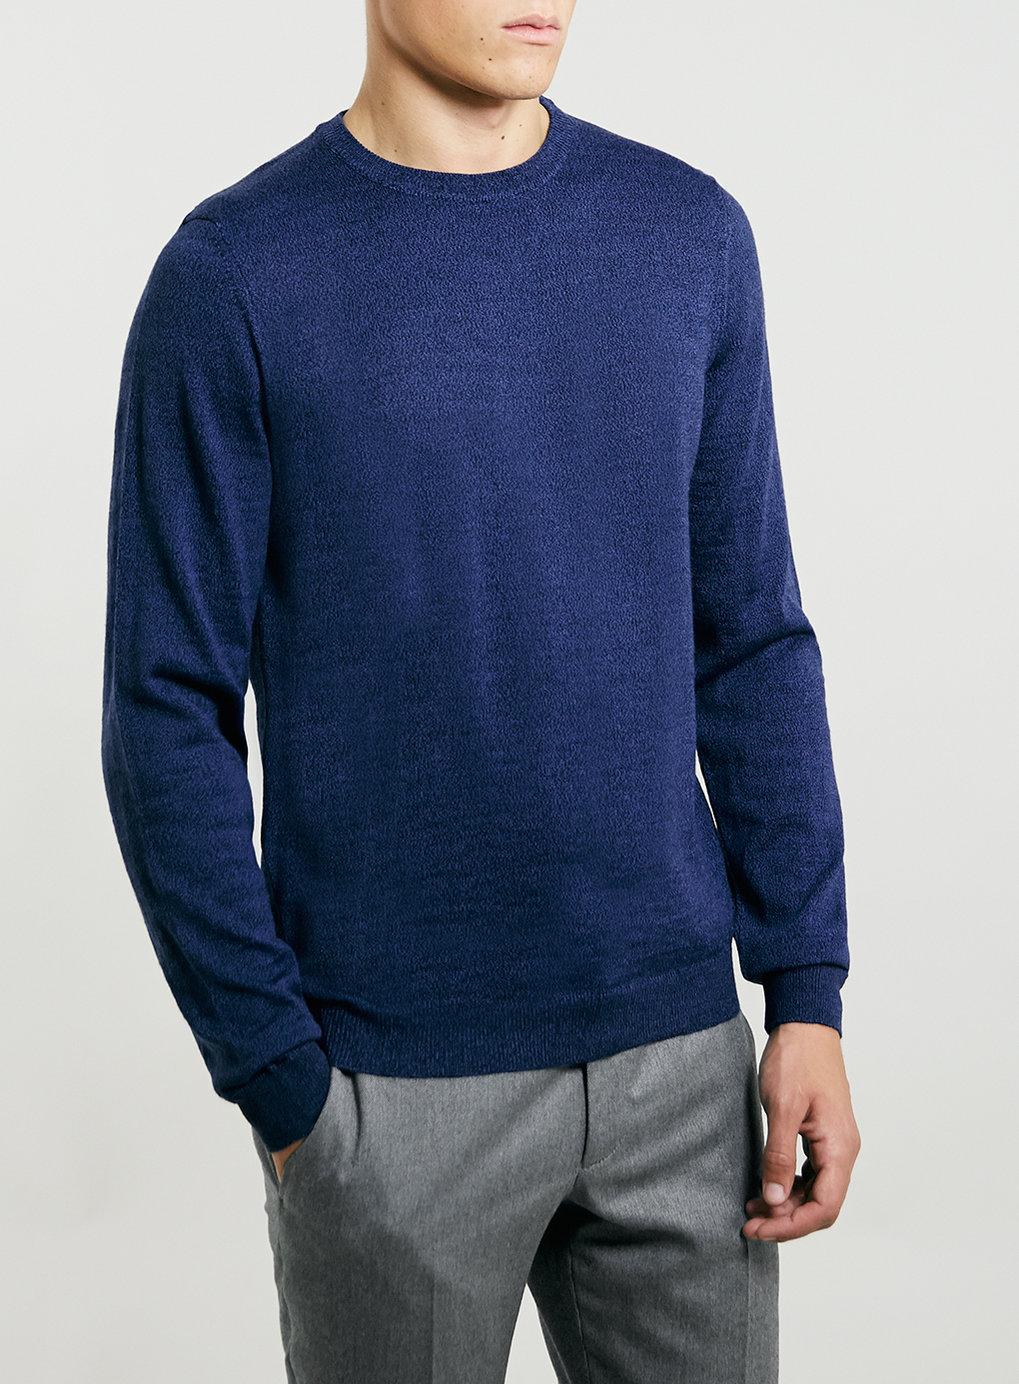 Blue/Black Merino Blend Twist Sweater , was$55,  now $44